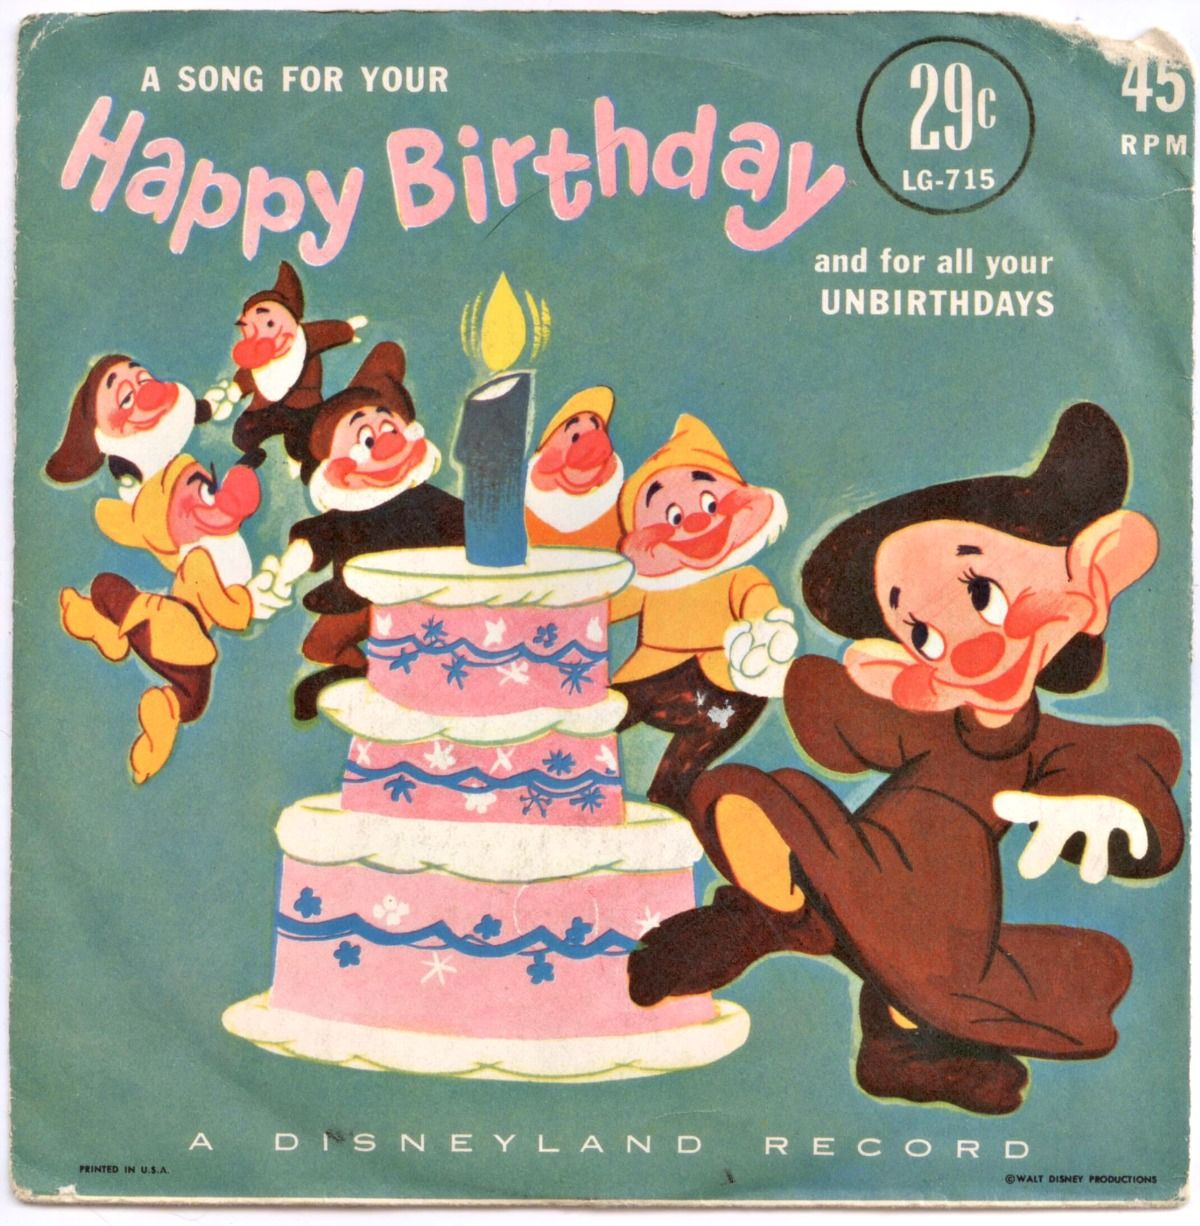 Happy Birthday A Disneyland Record 7 Disney Records Pinterest